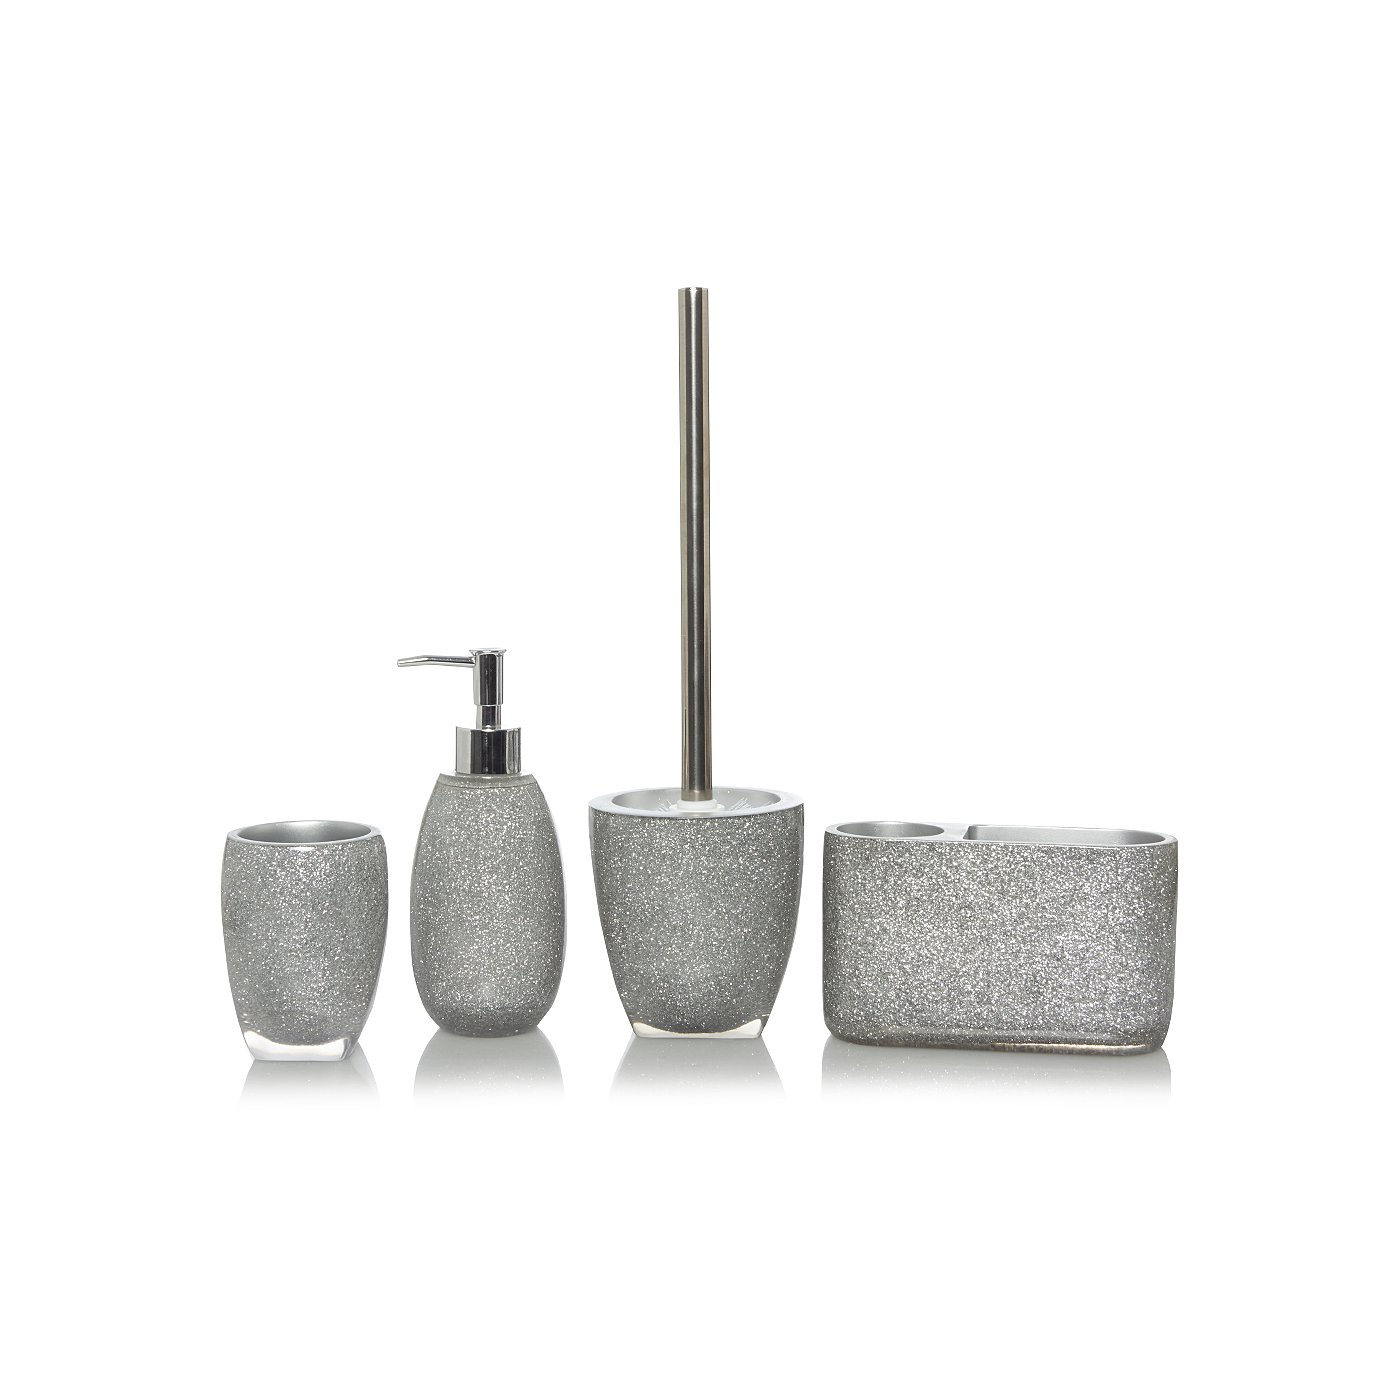 black crackle bathroom accessories. Bathroom Accessories Home Garden George At Asda  Crackle Glass dact us